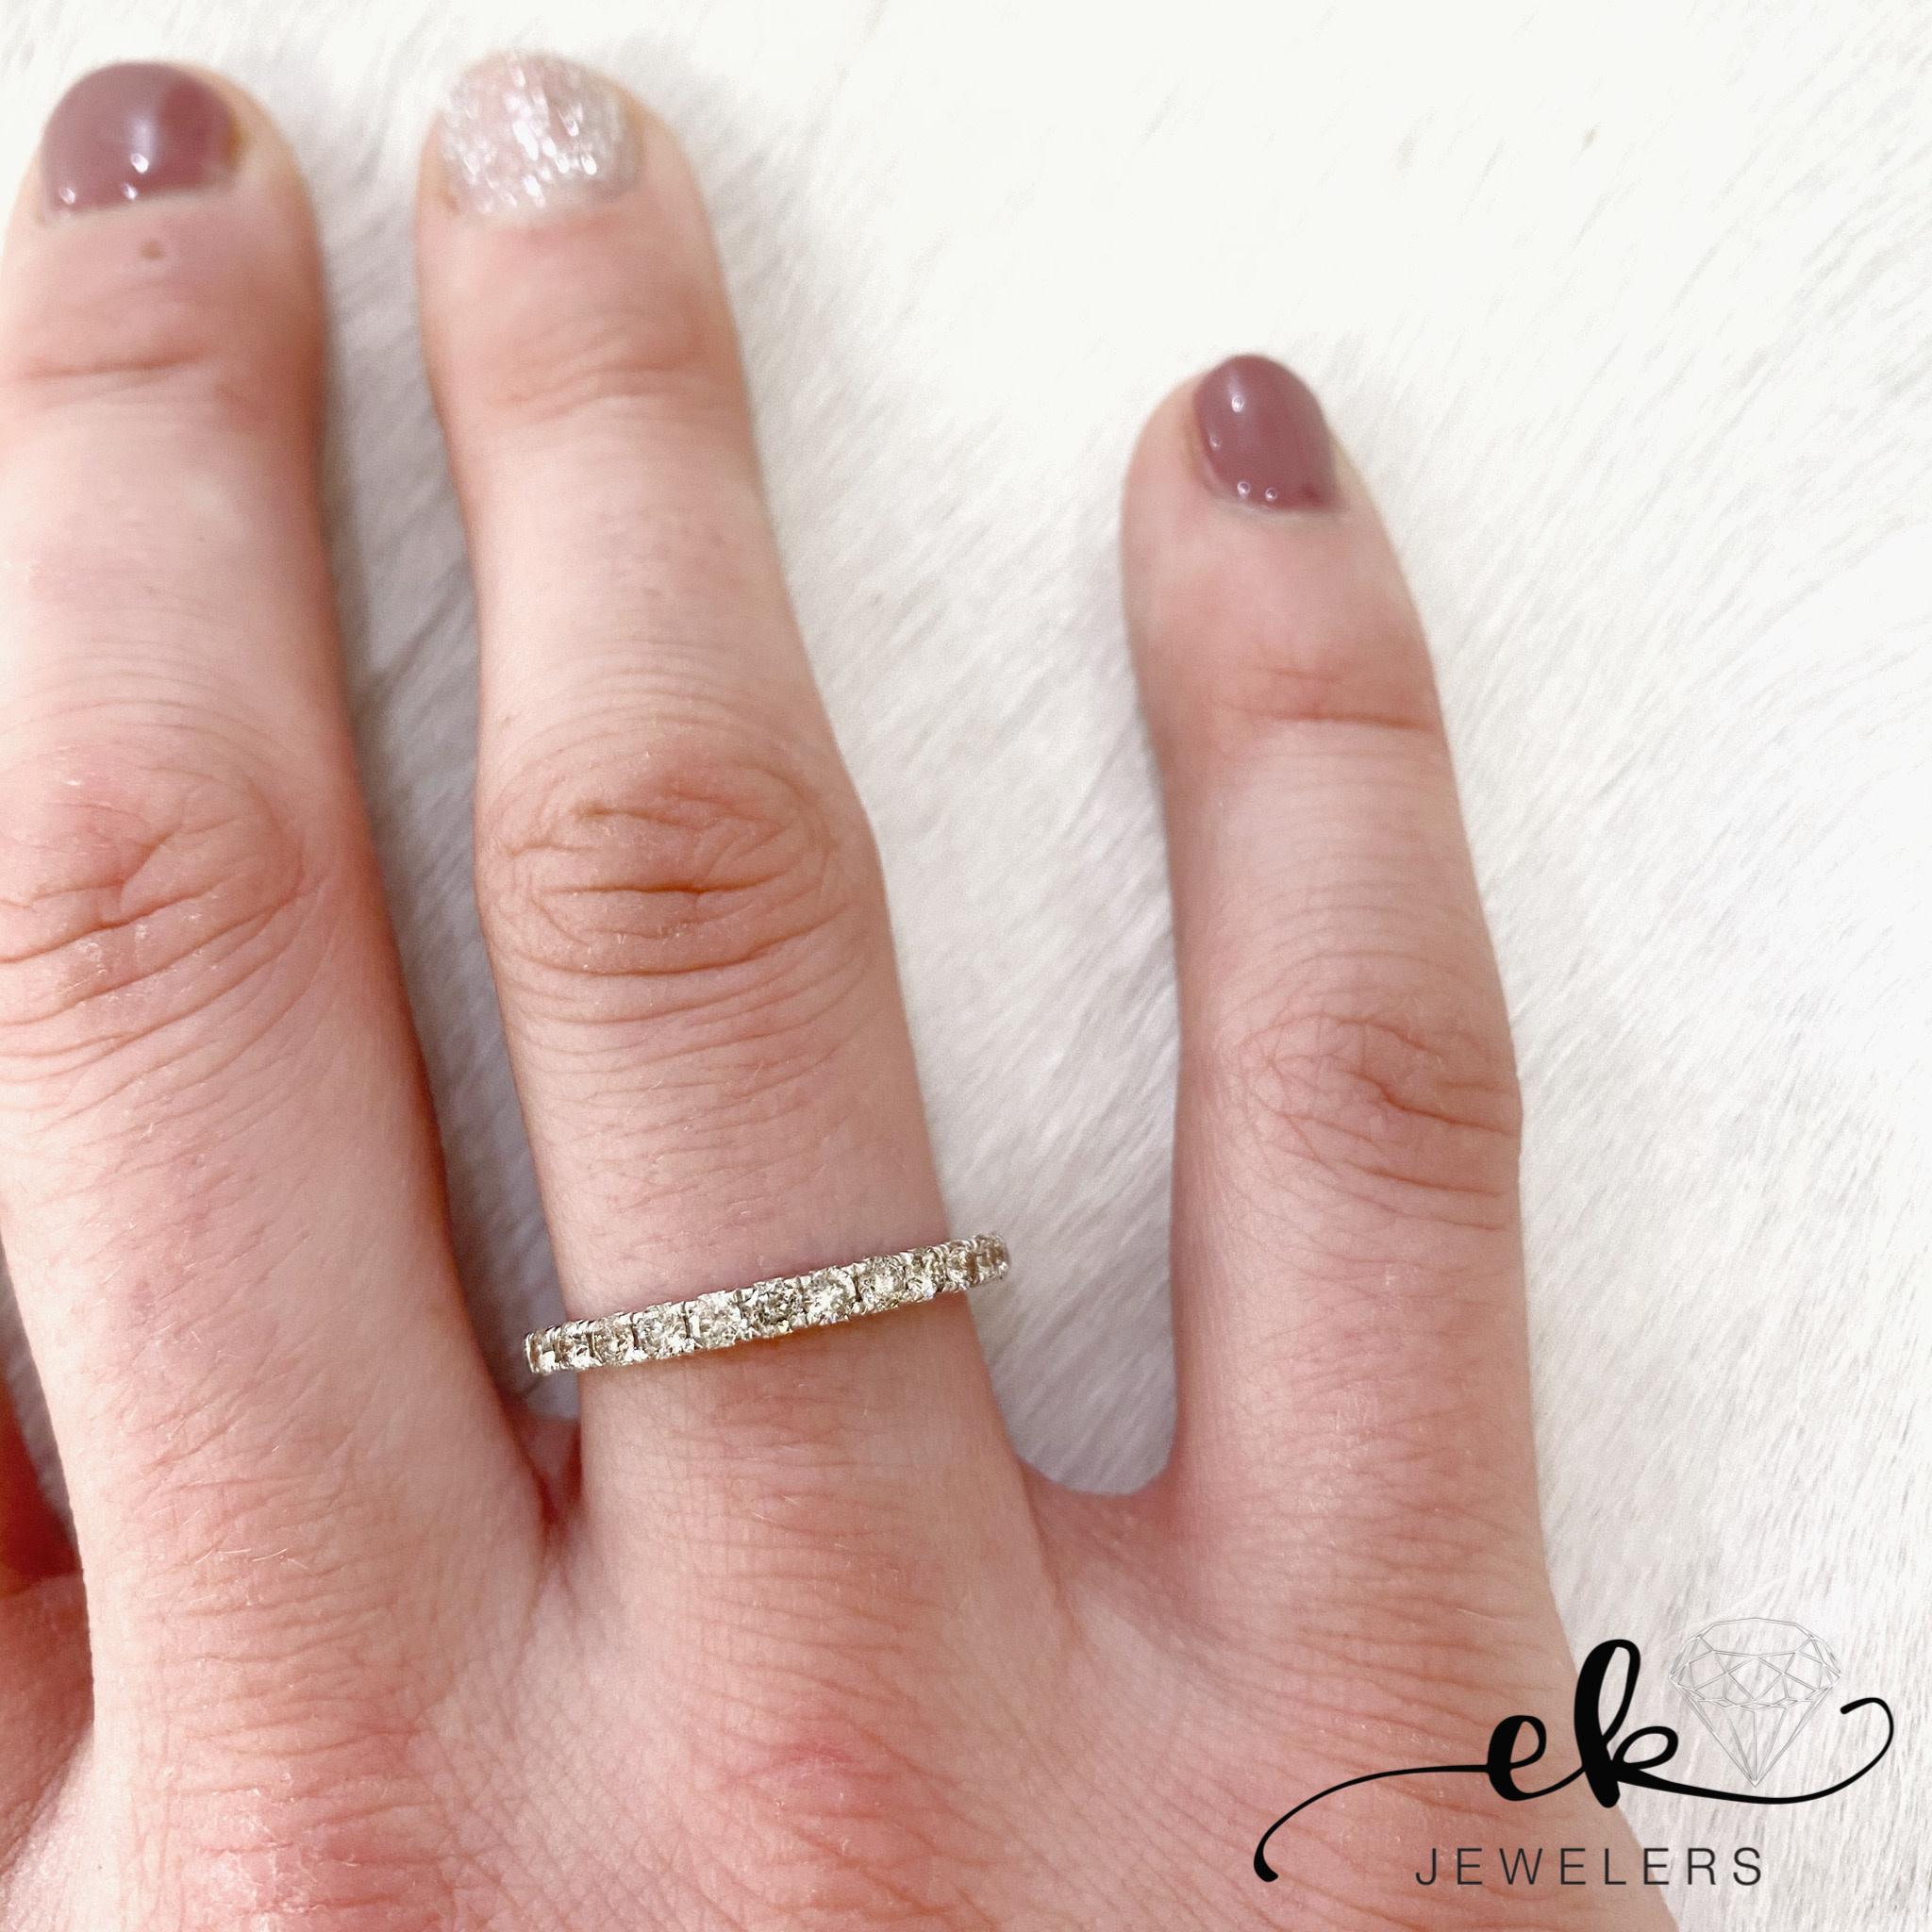 10k Gold Diamond Band Ring